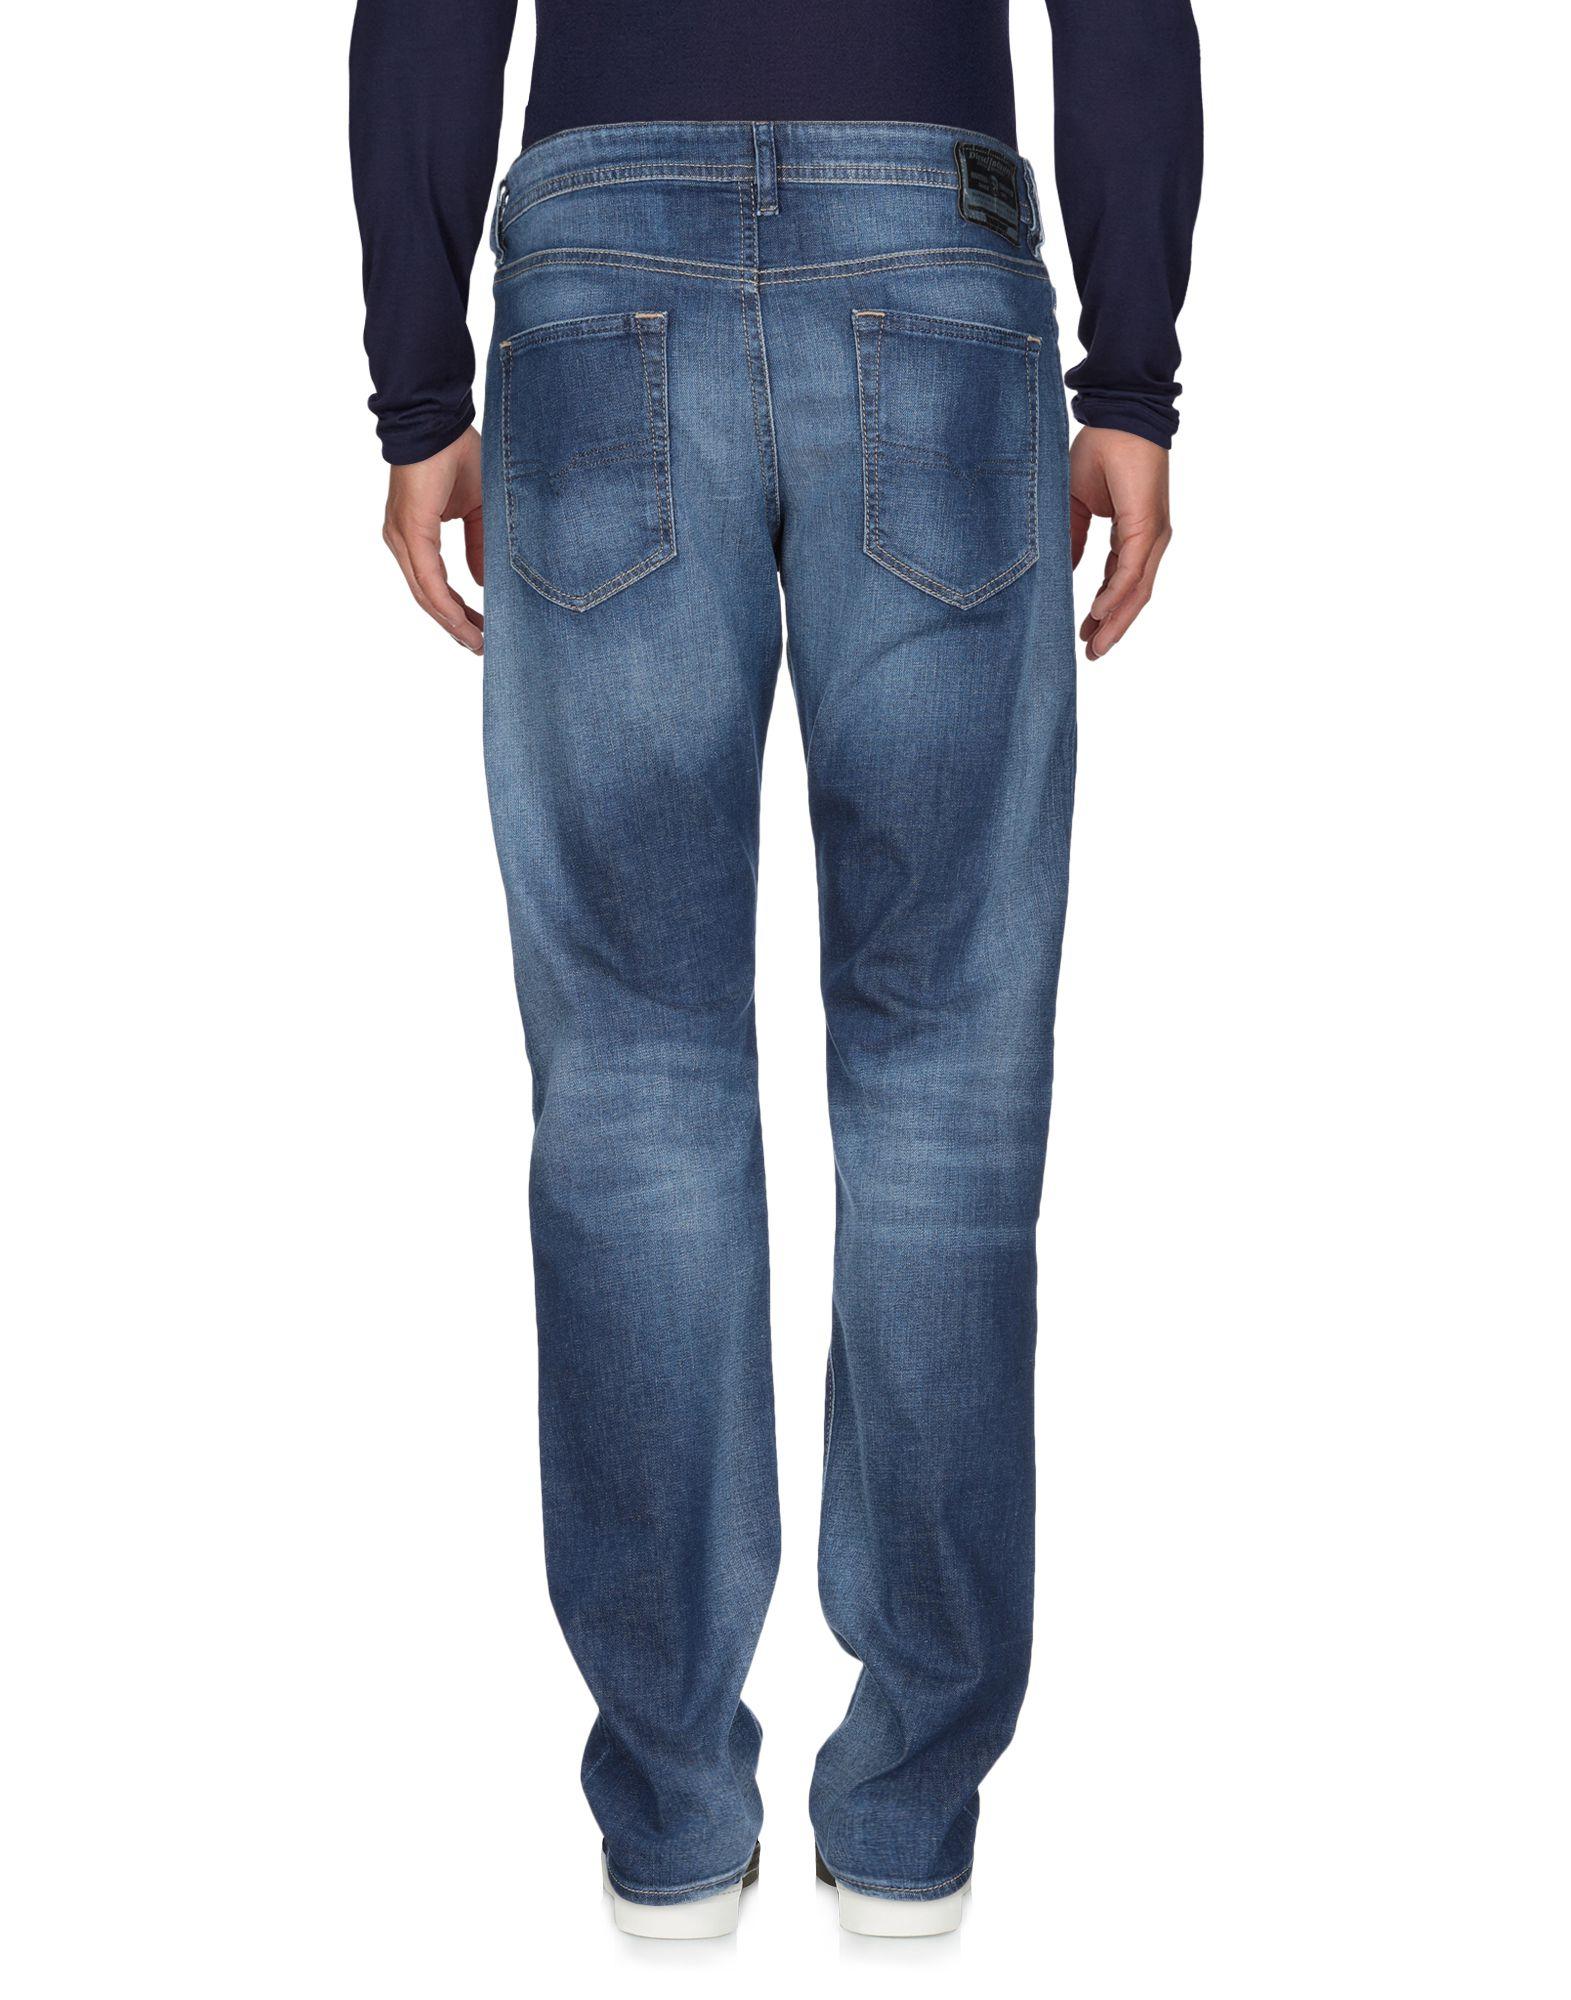 Pantaloni Jeans Diesel Uomo Uomo Diesel - 42687972CB 5b979c